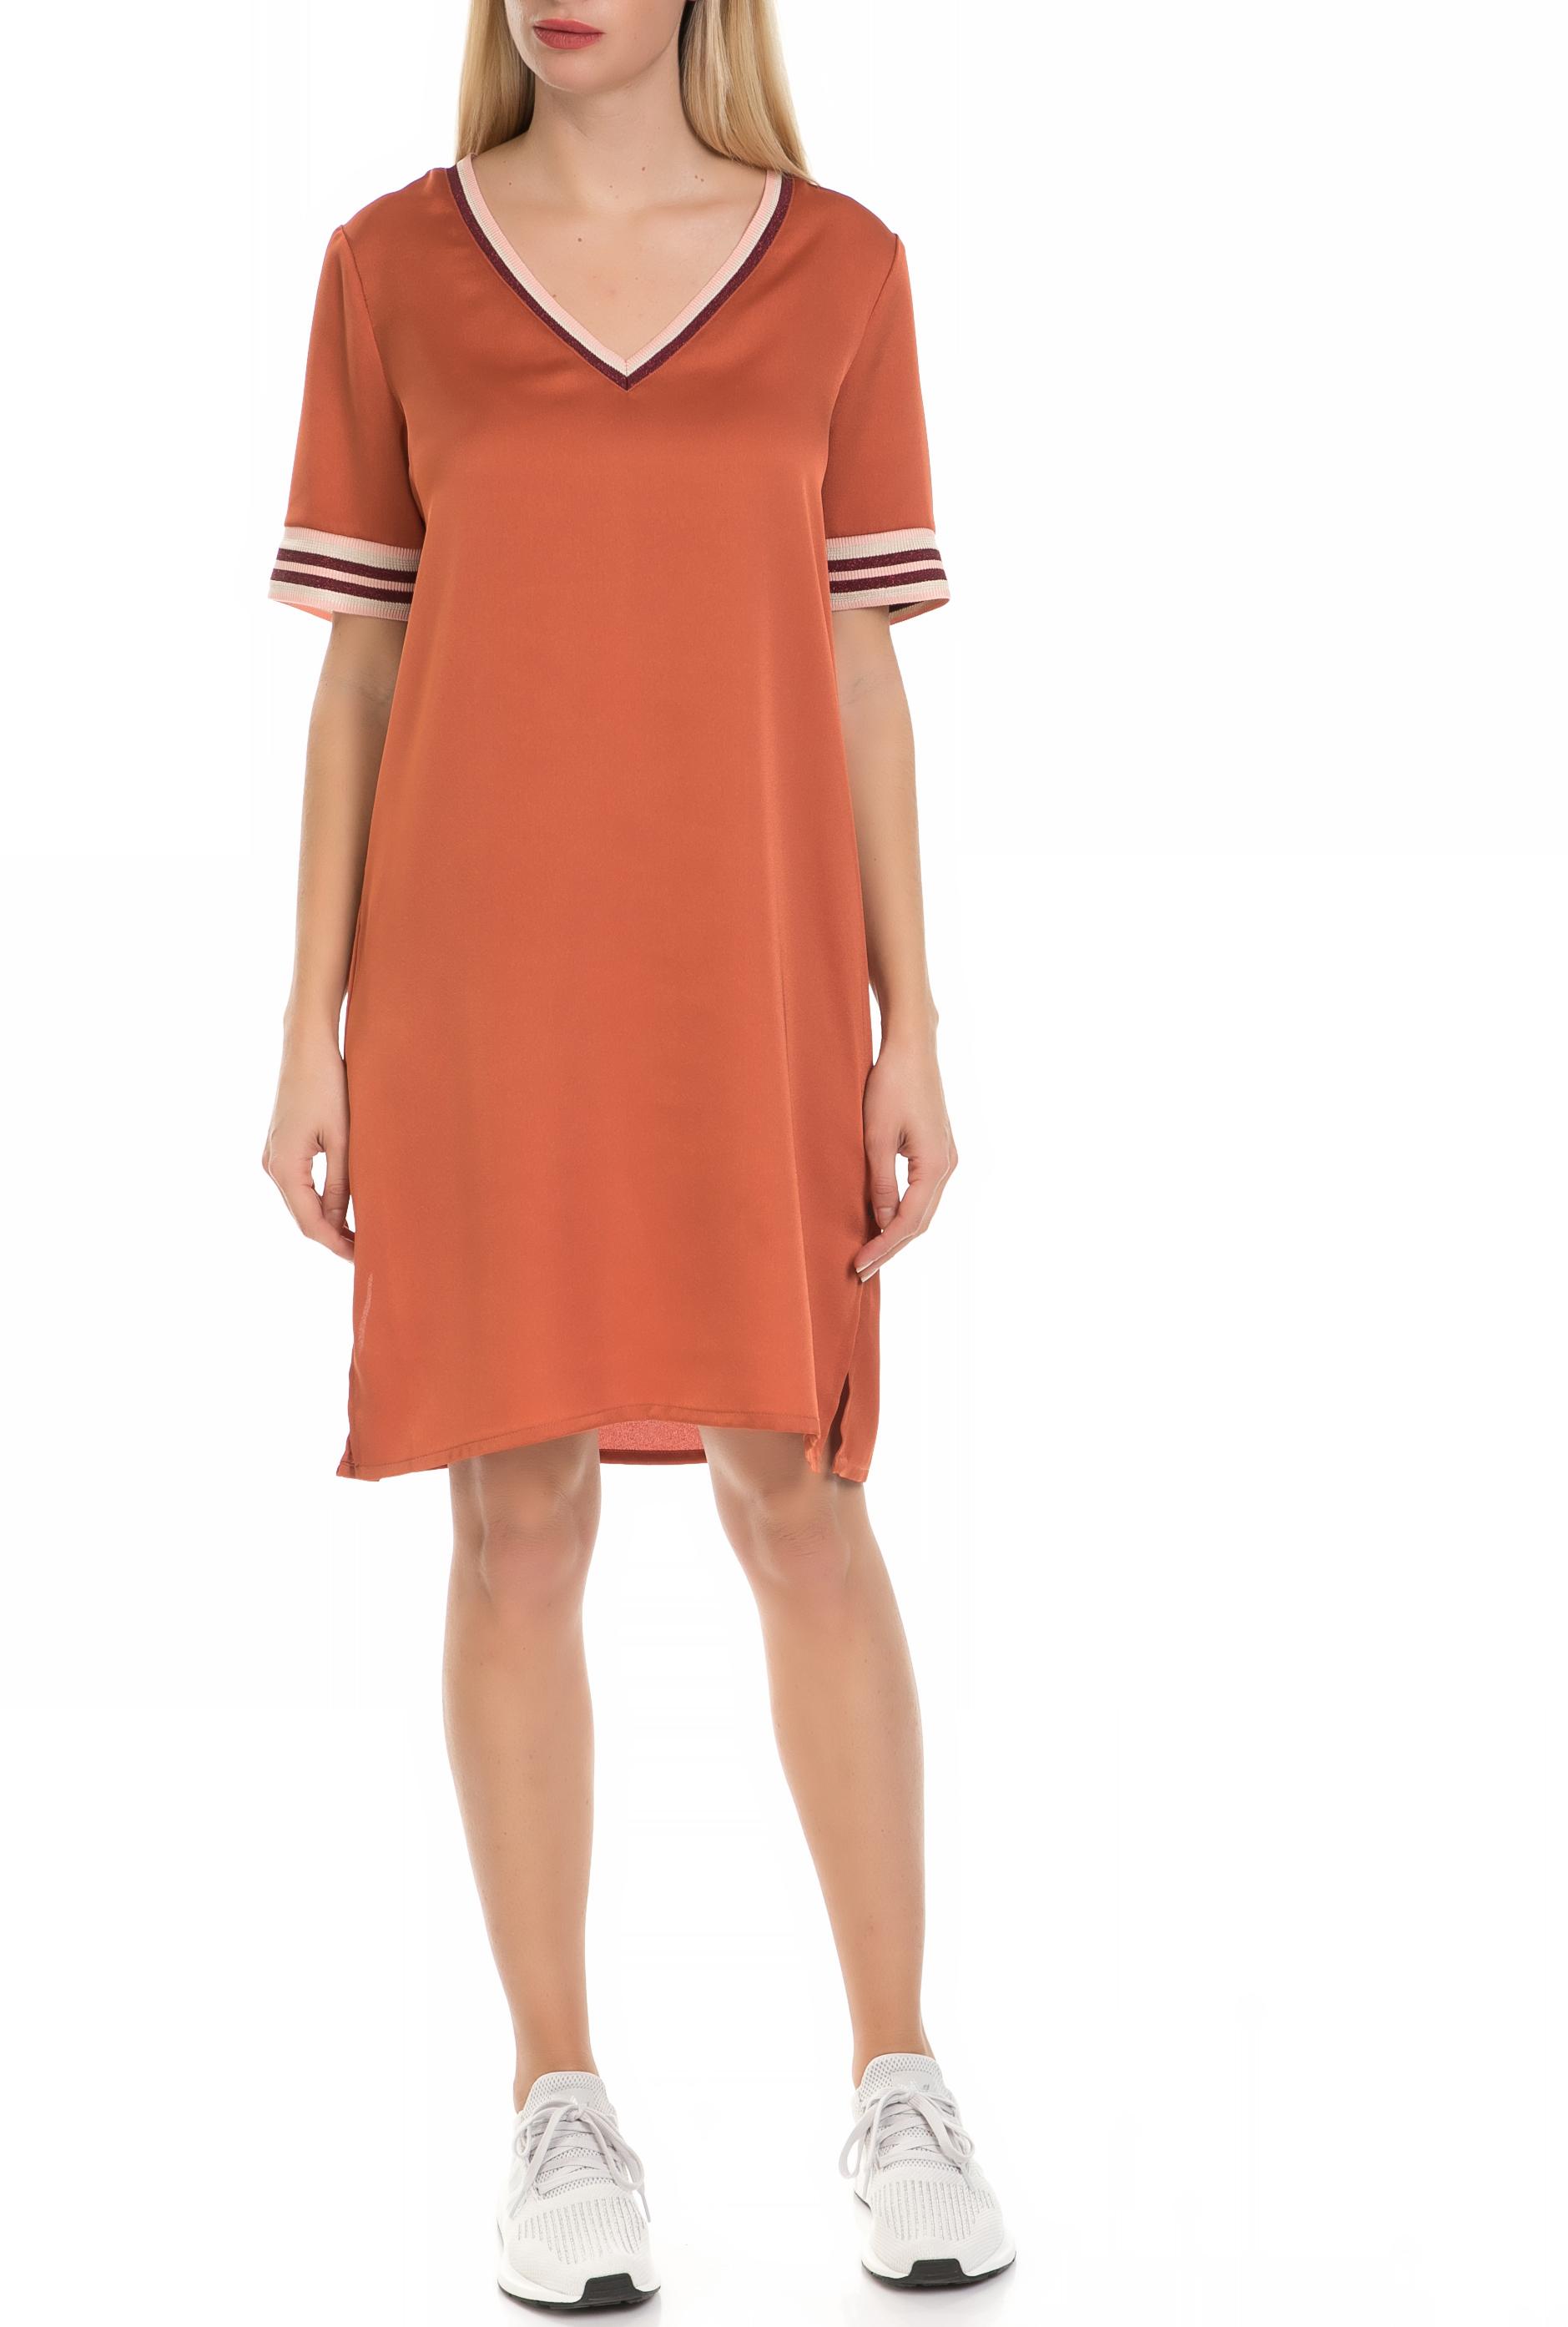 SCOTCH & SODA - Γυναικείό φόρεμα SCOTCH & SODA πορτοκαλί γυναικεία ρούχα φόρεματα μίνι